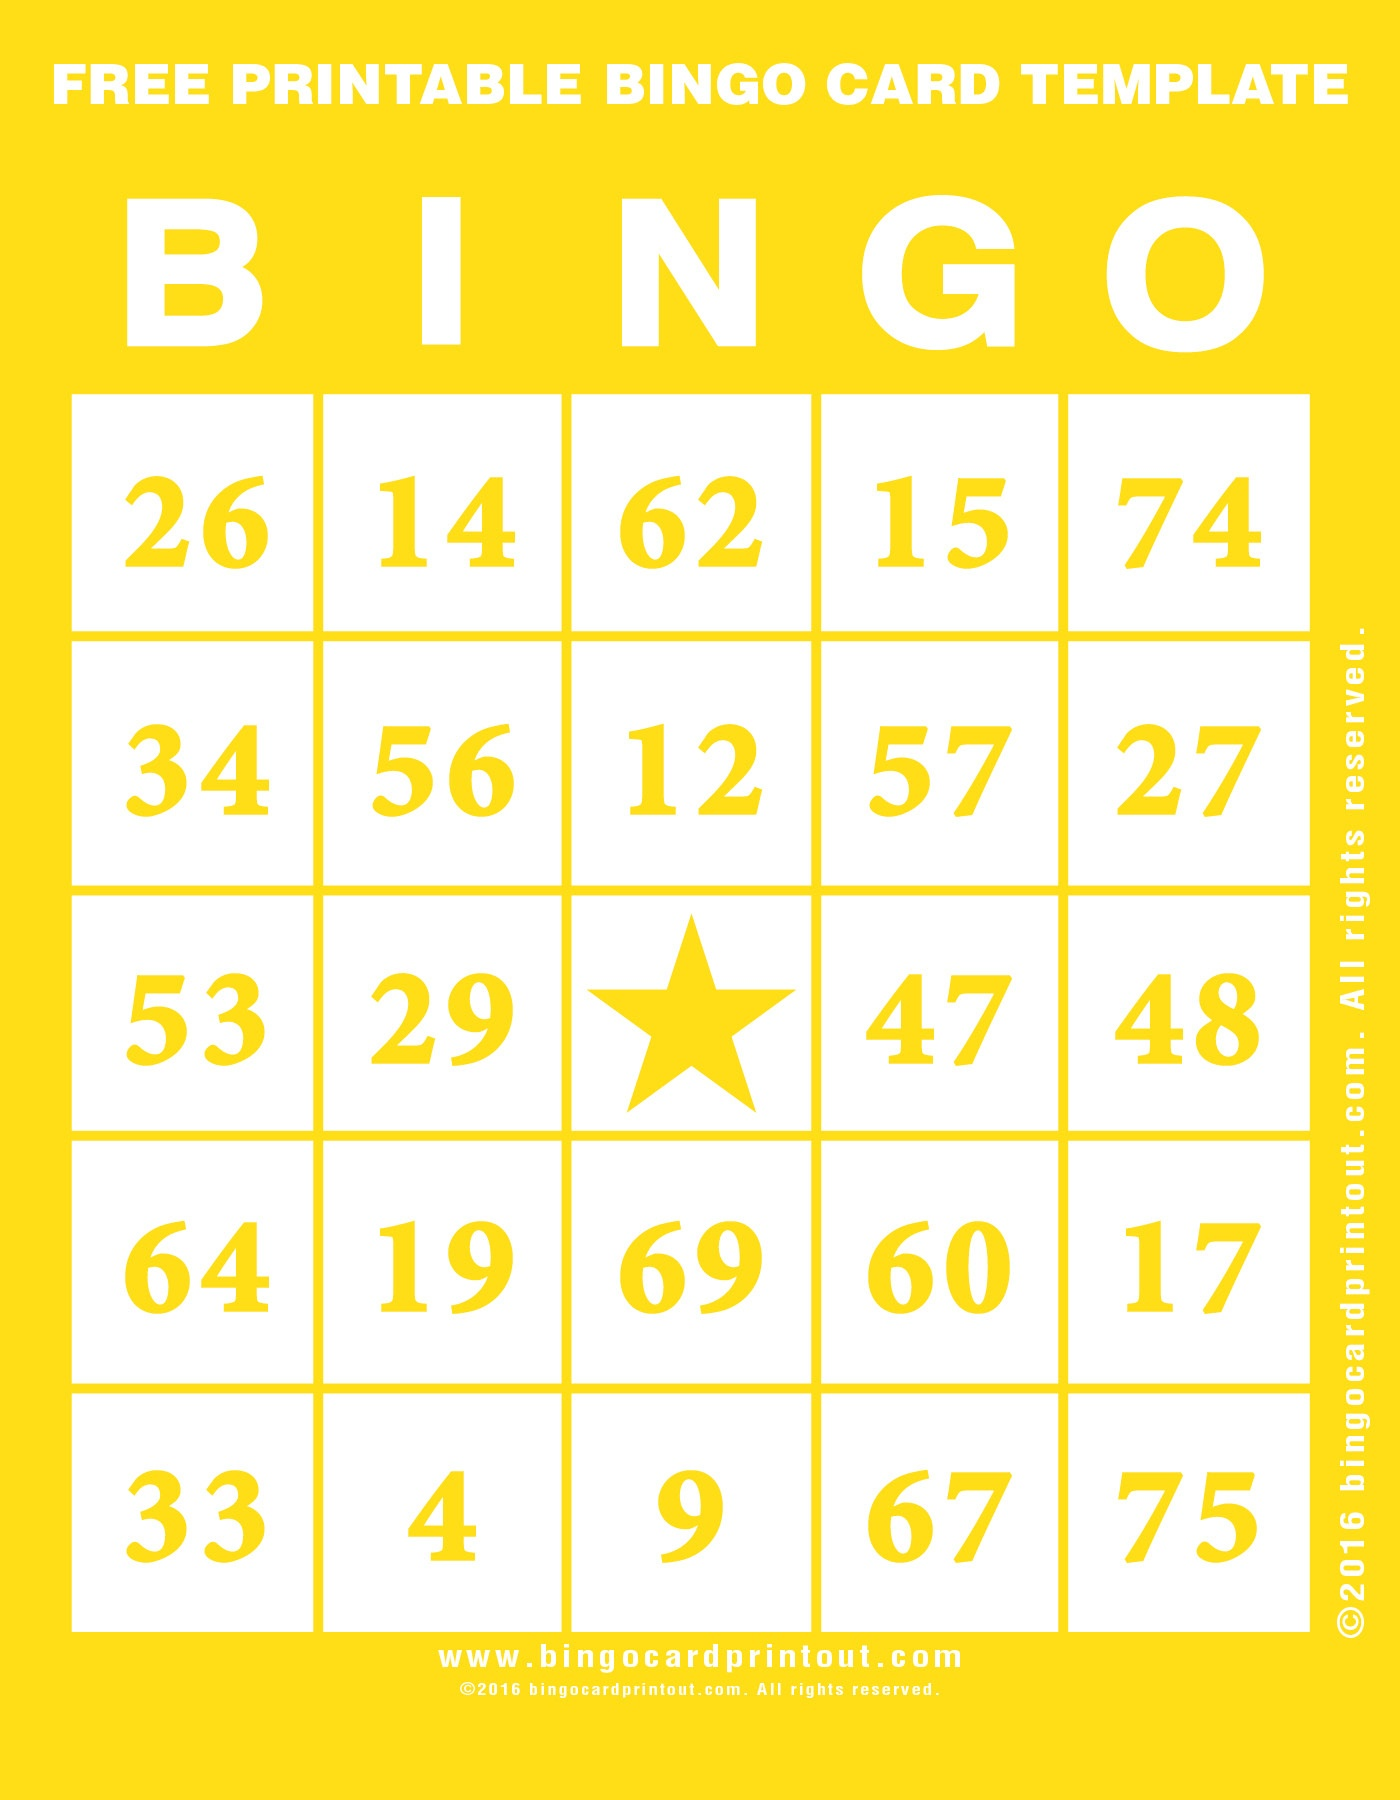 Free Printable Bingo Card Template - Bingocardprintout - Printable Bingo Template Free